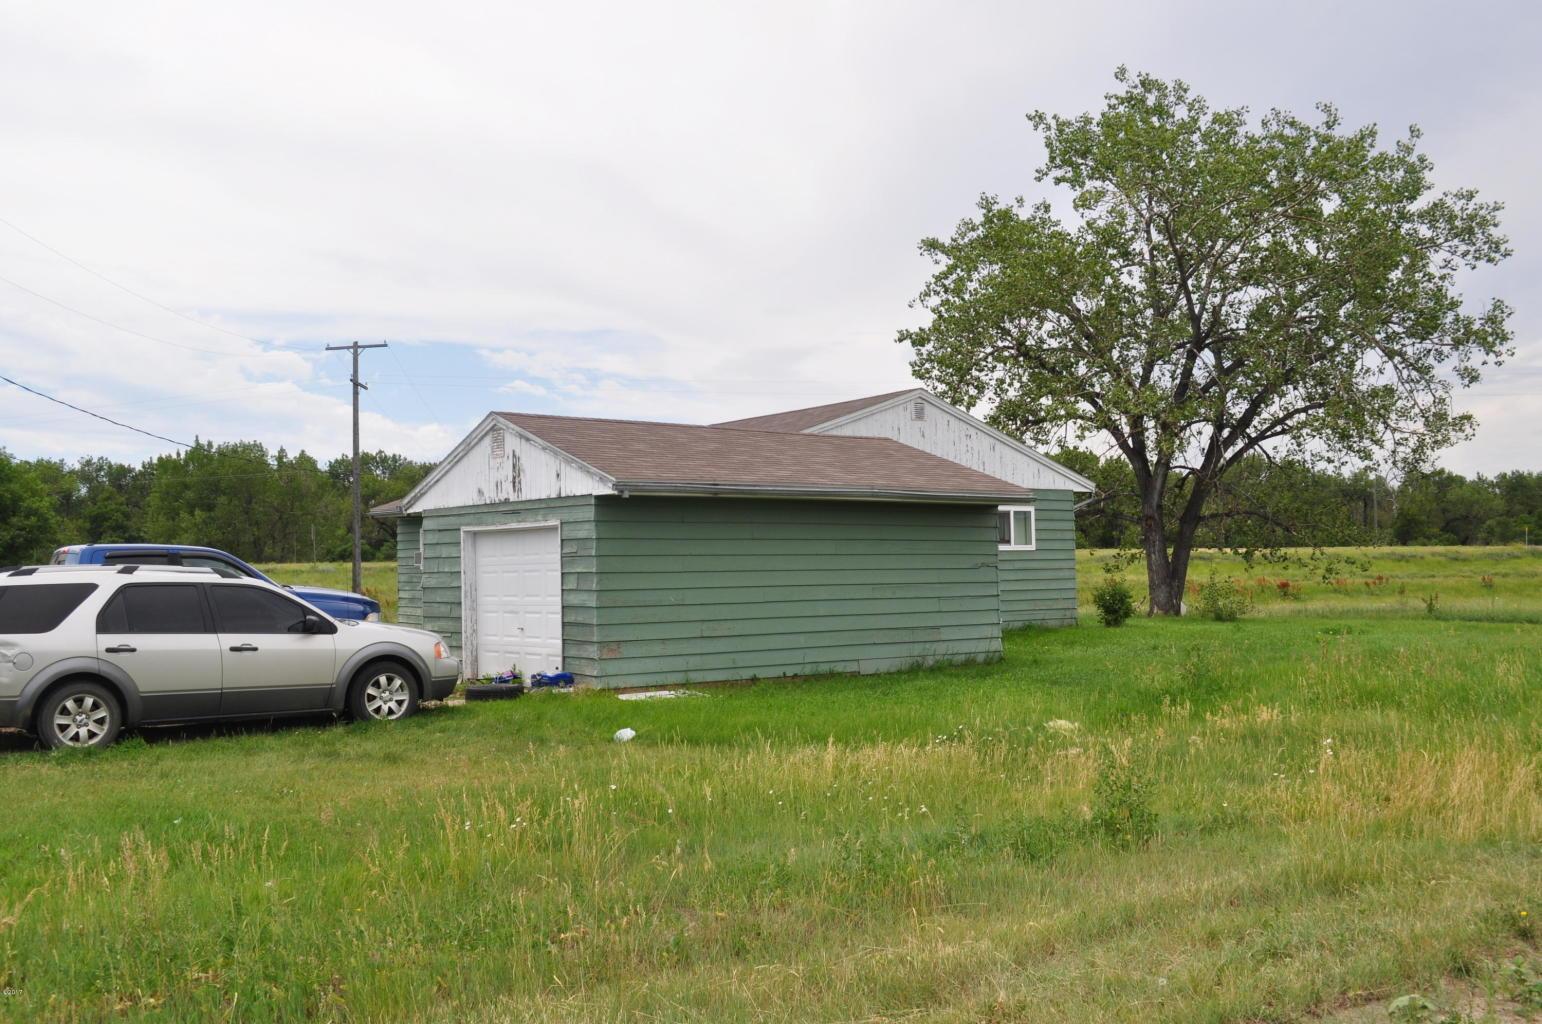 15 - Houses Garage